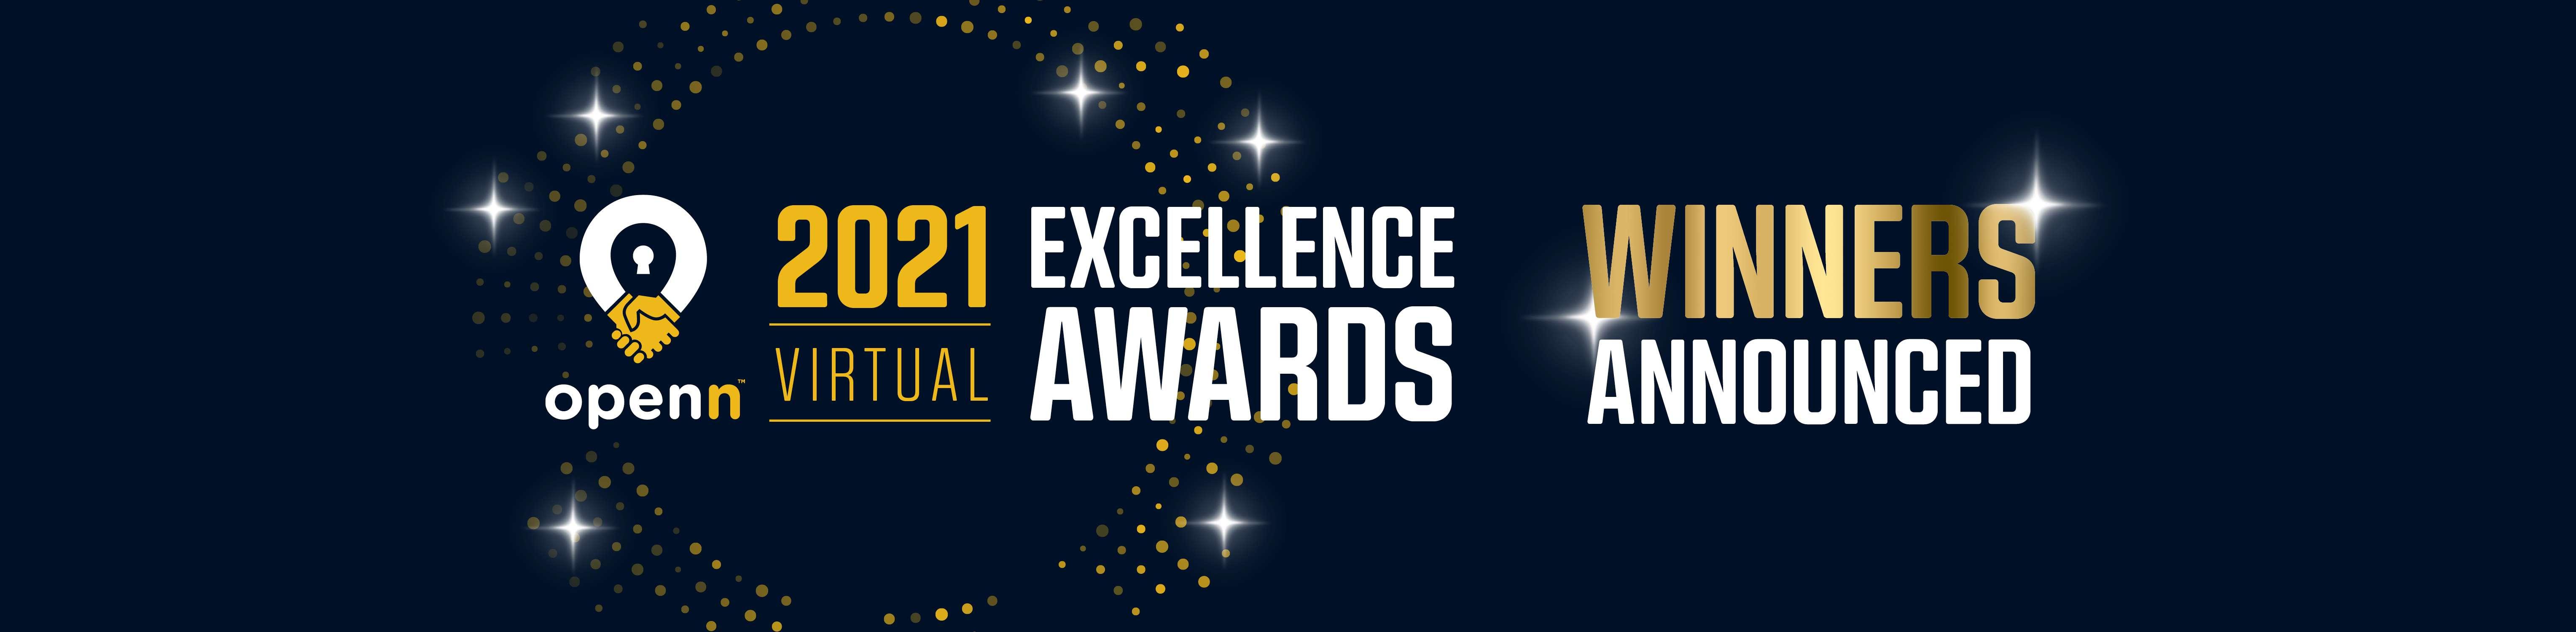 Openn Excellence Awards_LP banner_Winners_6110x1500px_1